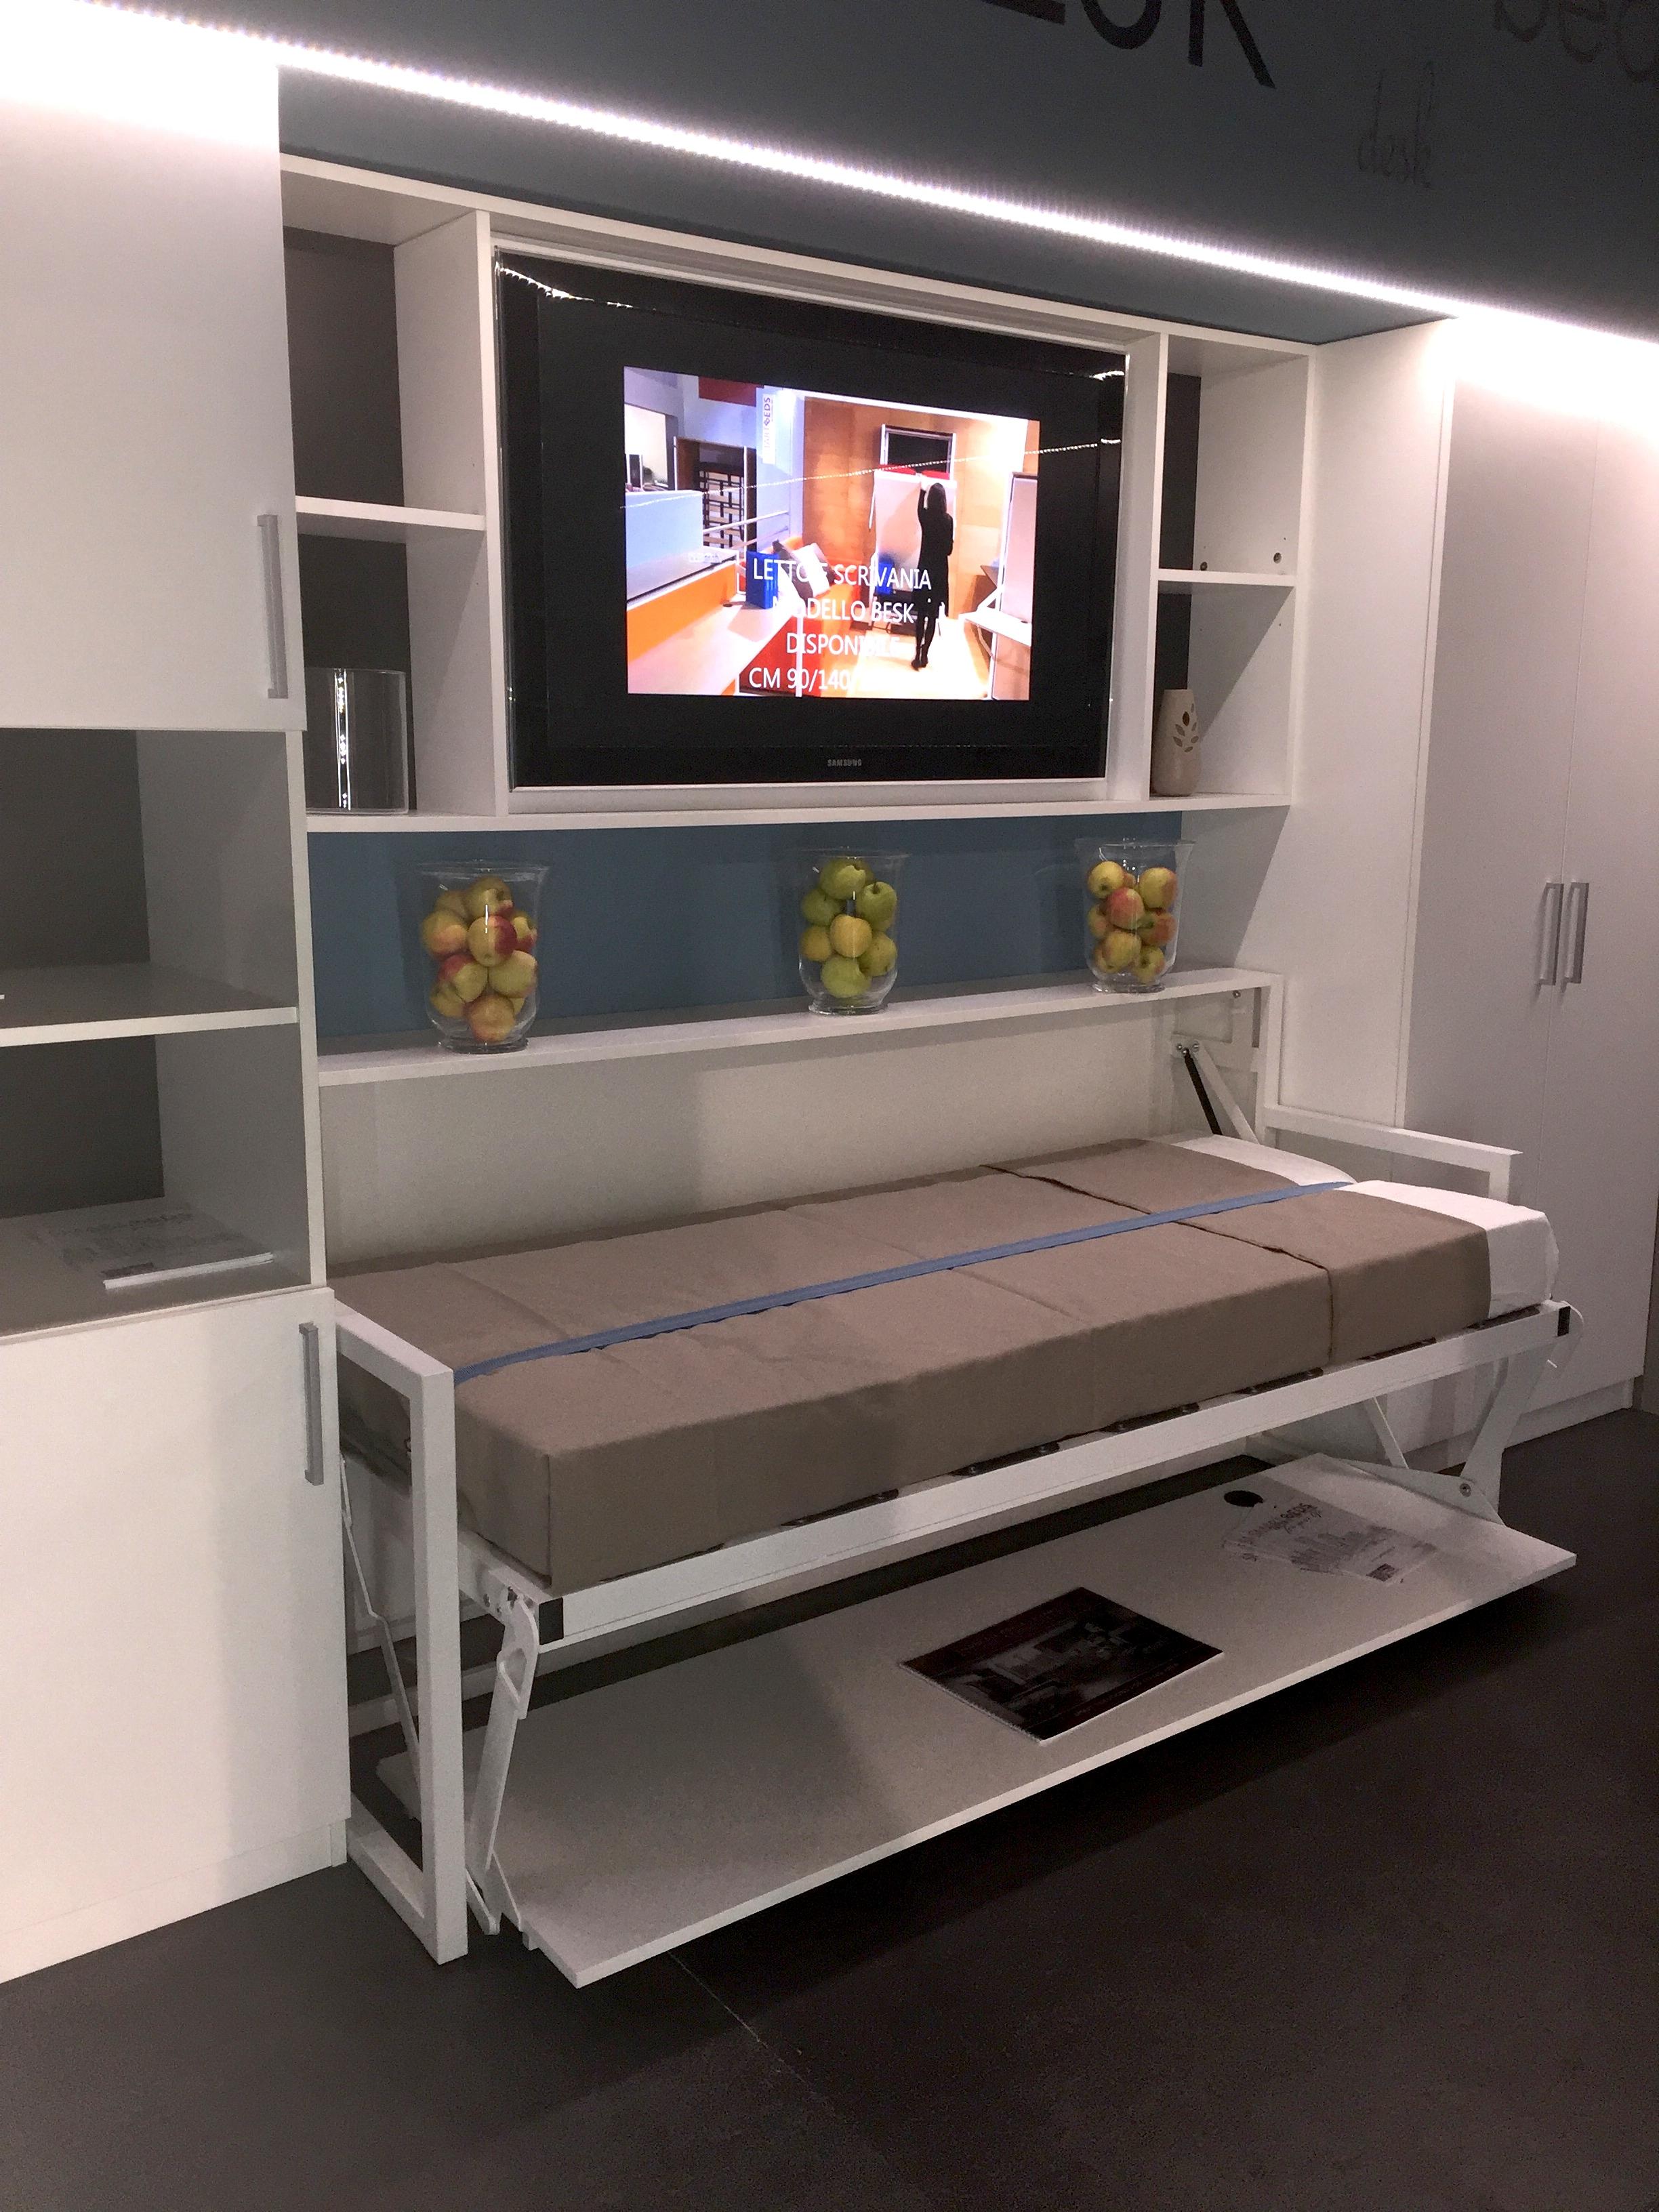 B-Esk Freestanding horizontal Bed